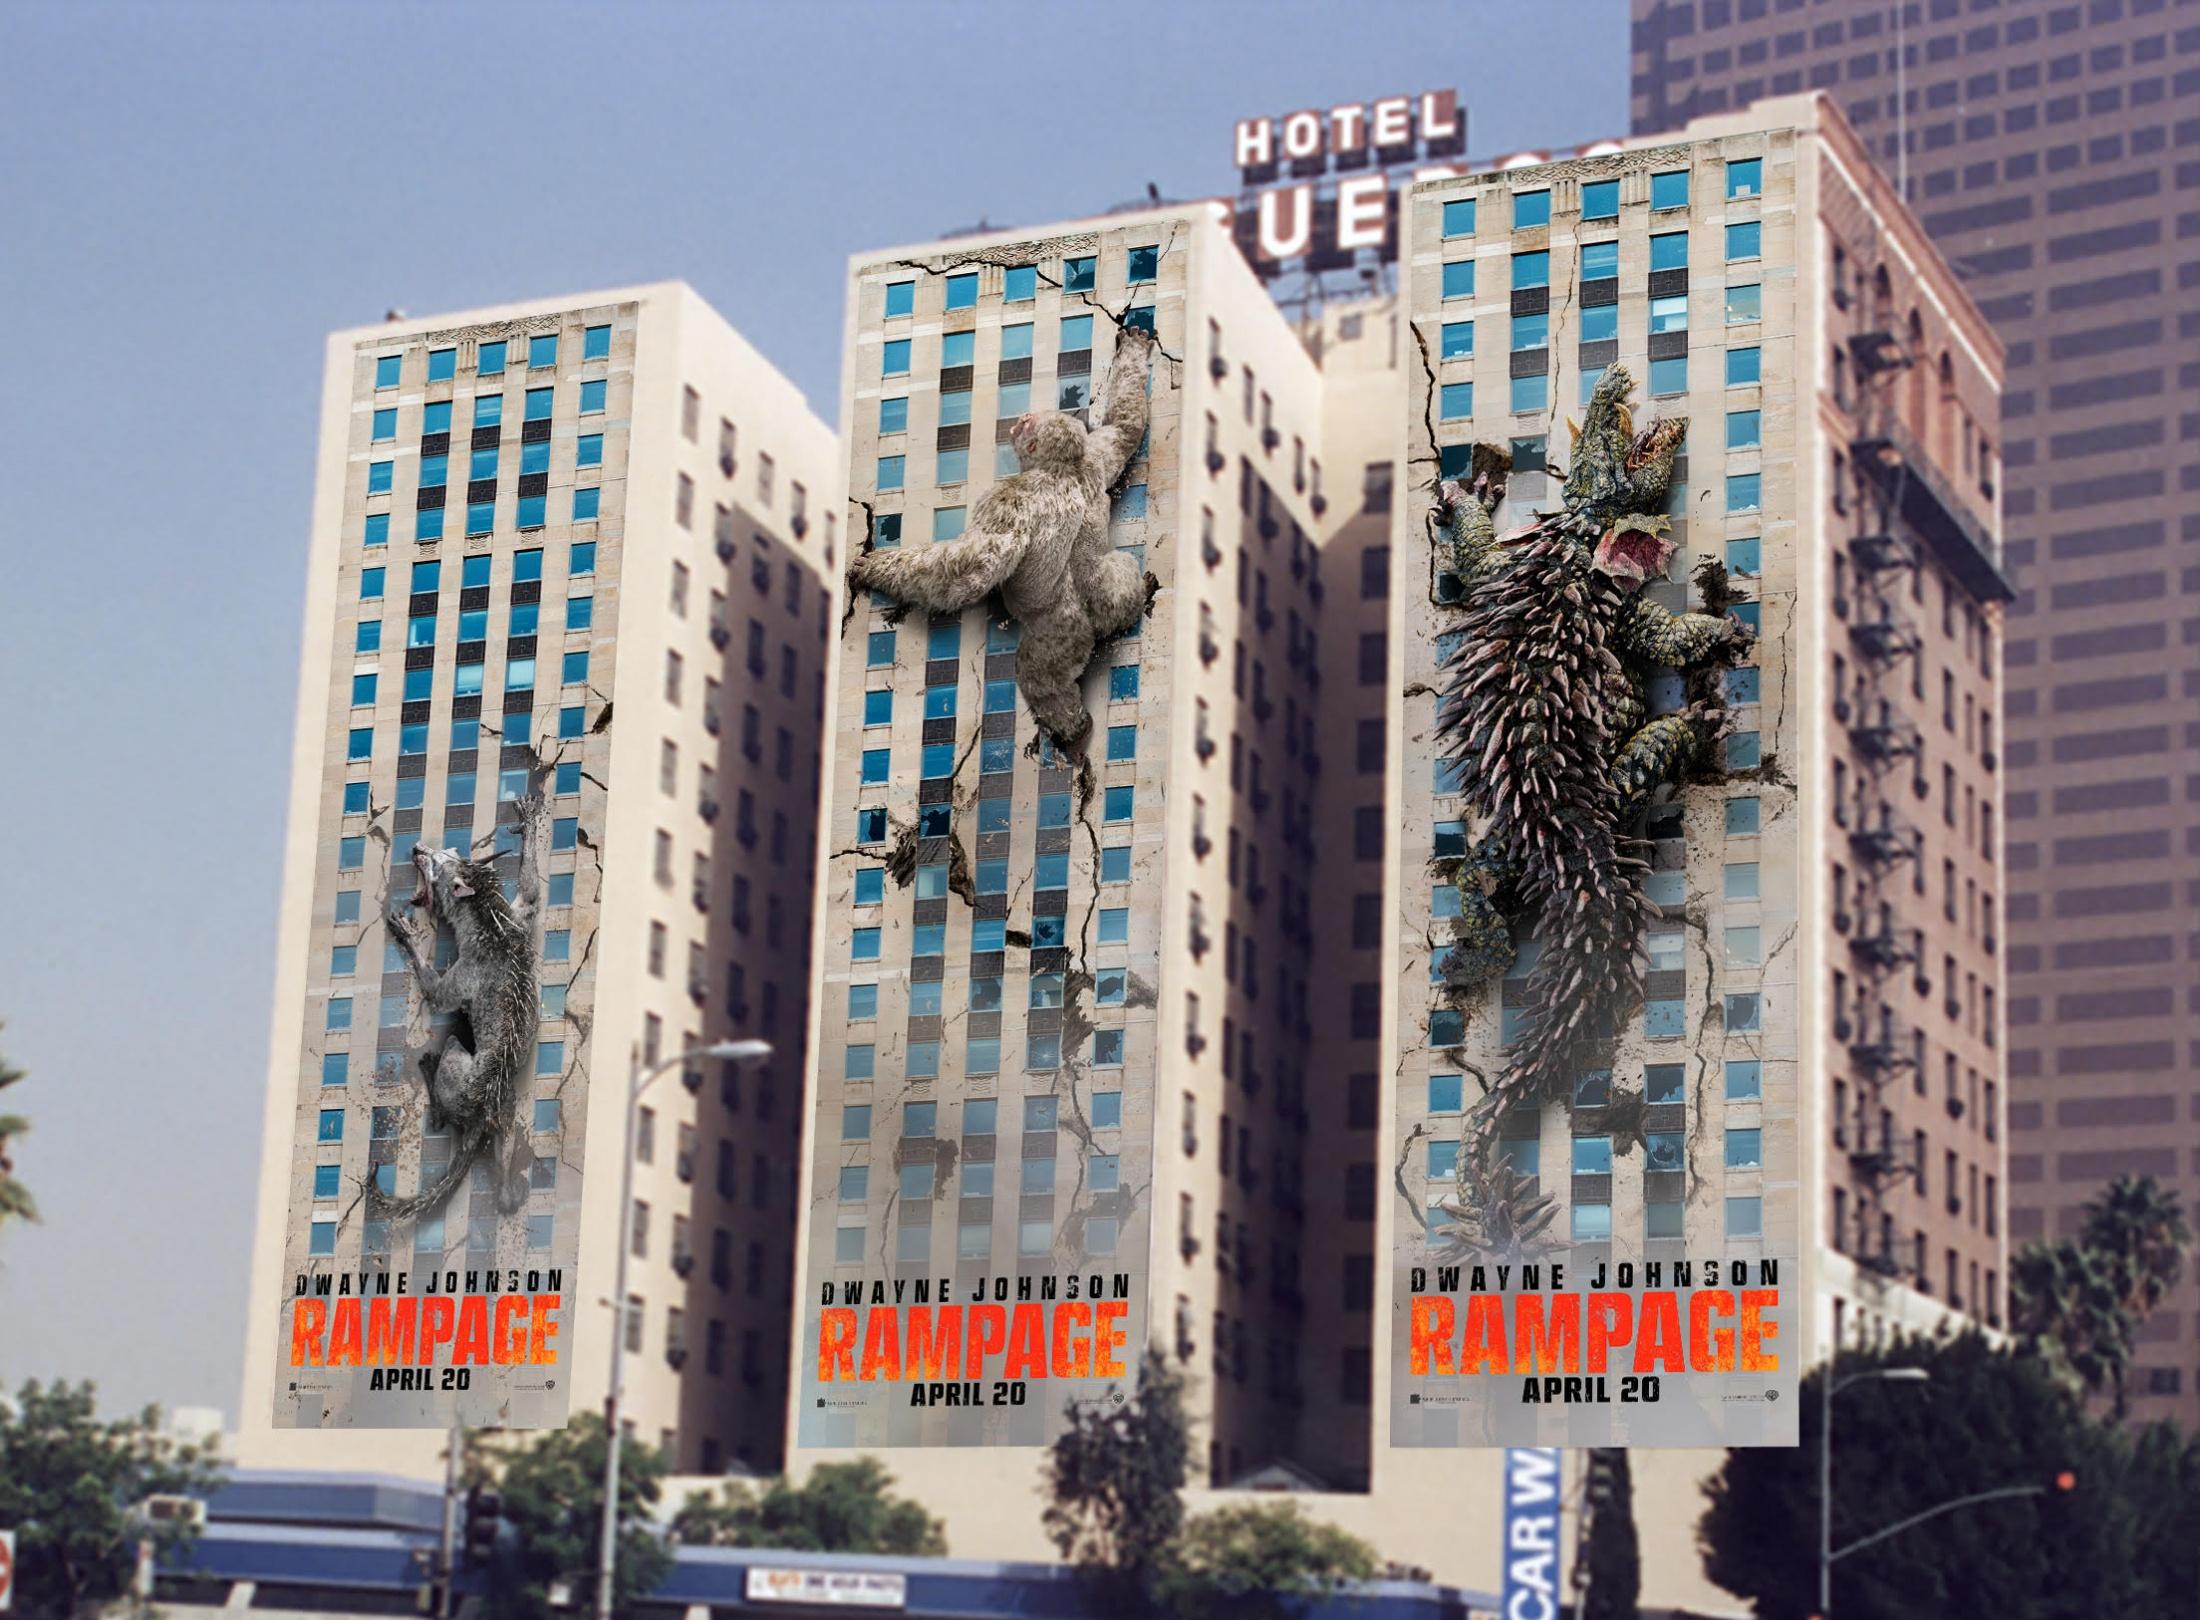 Thumbnail for Rampage - Hotel Figueroa